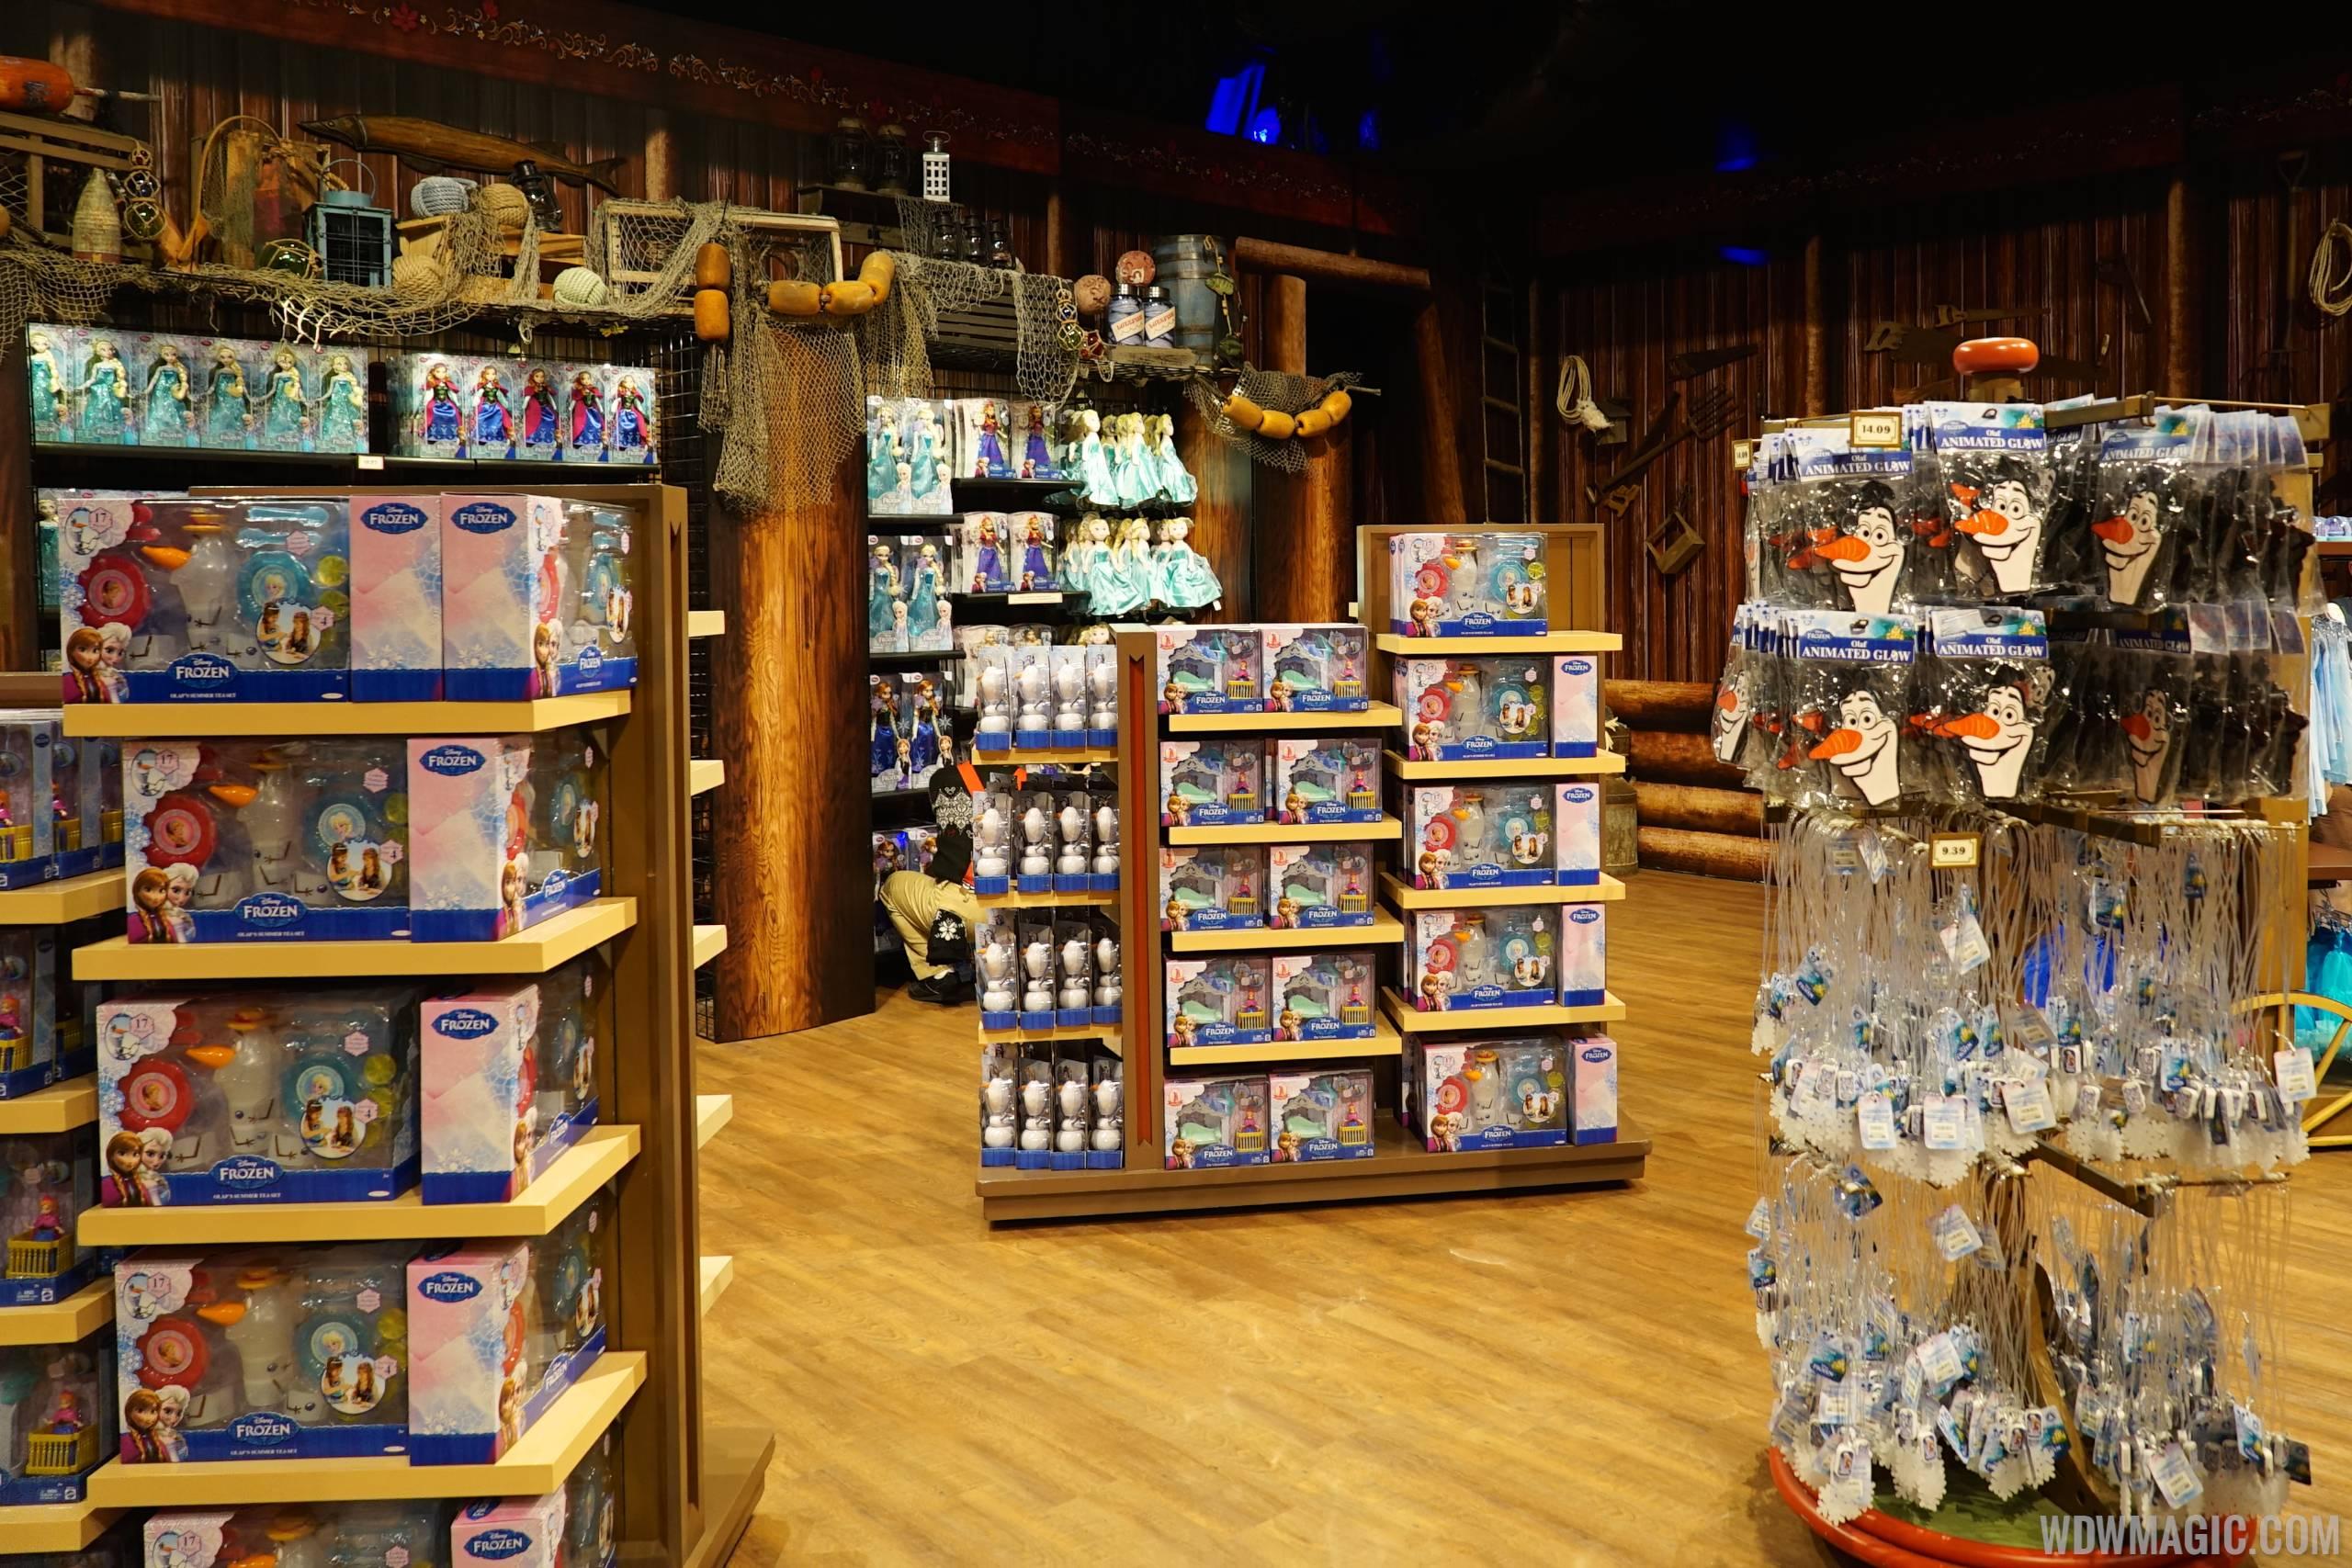 Inside the Frozen gift store